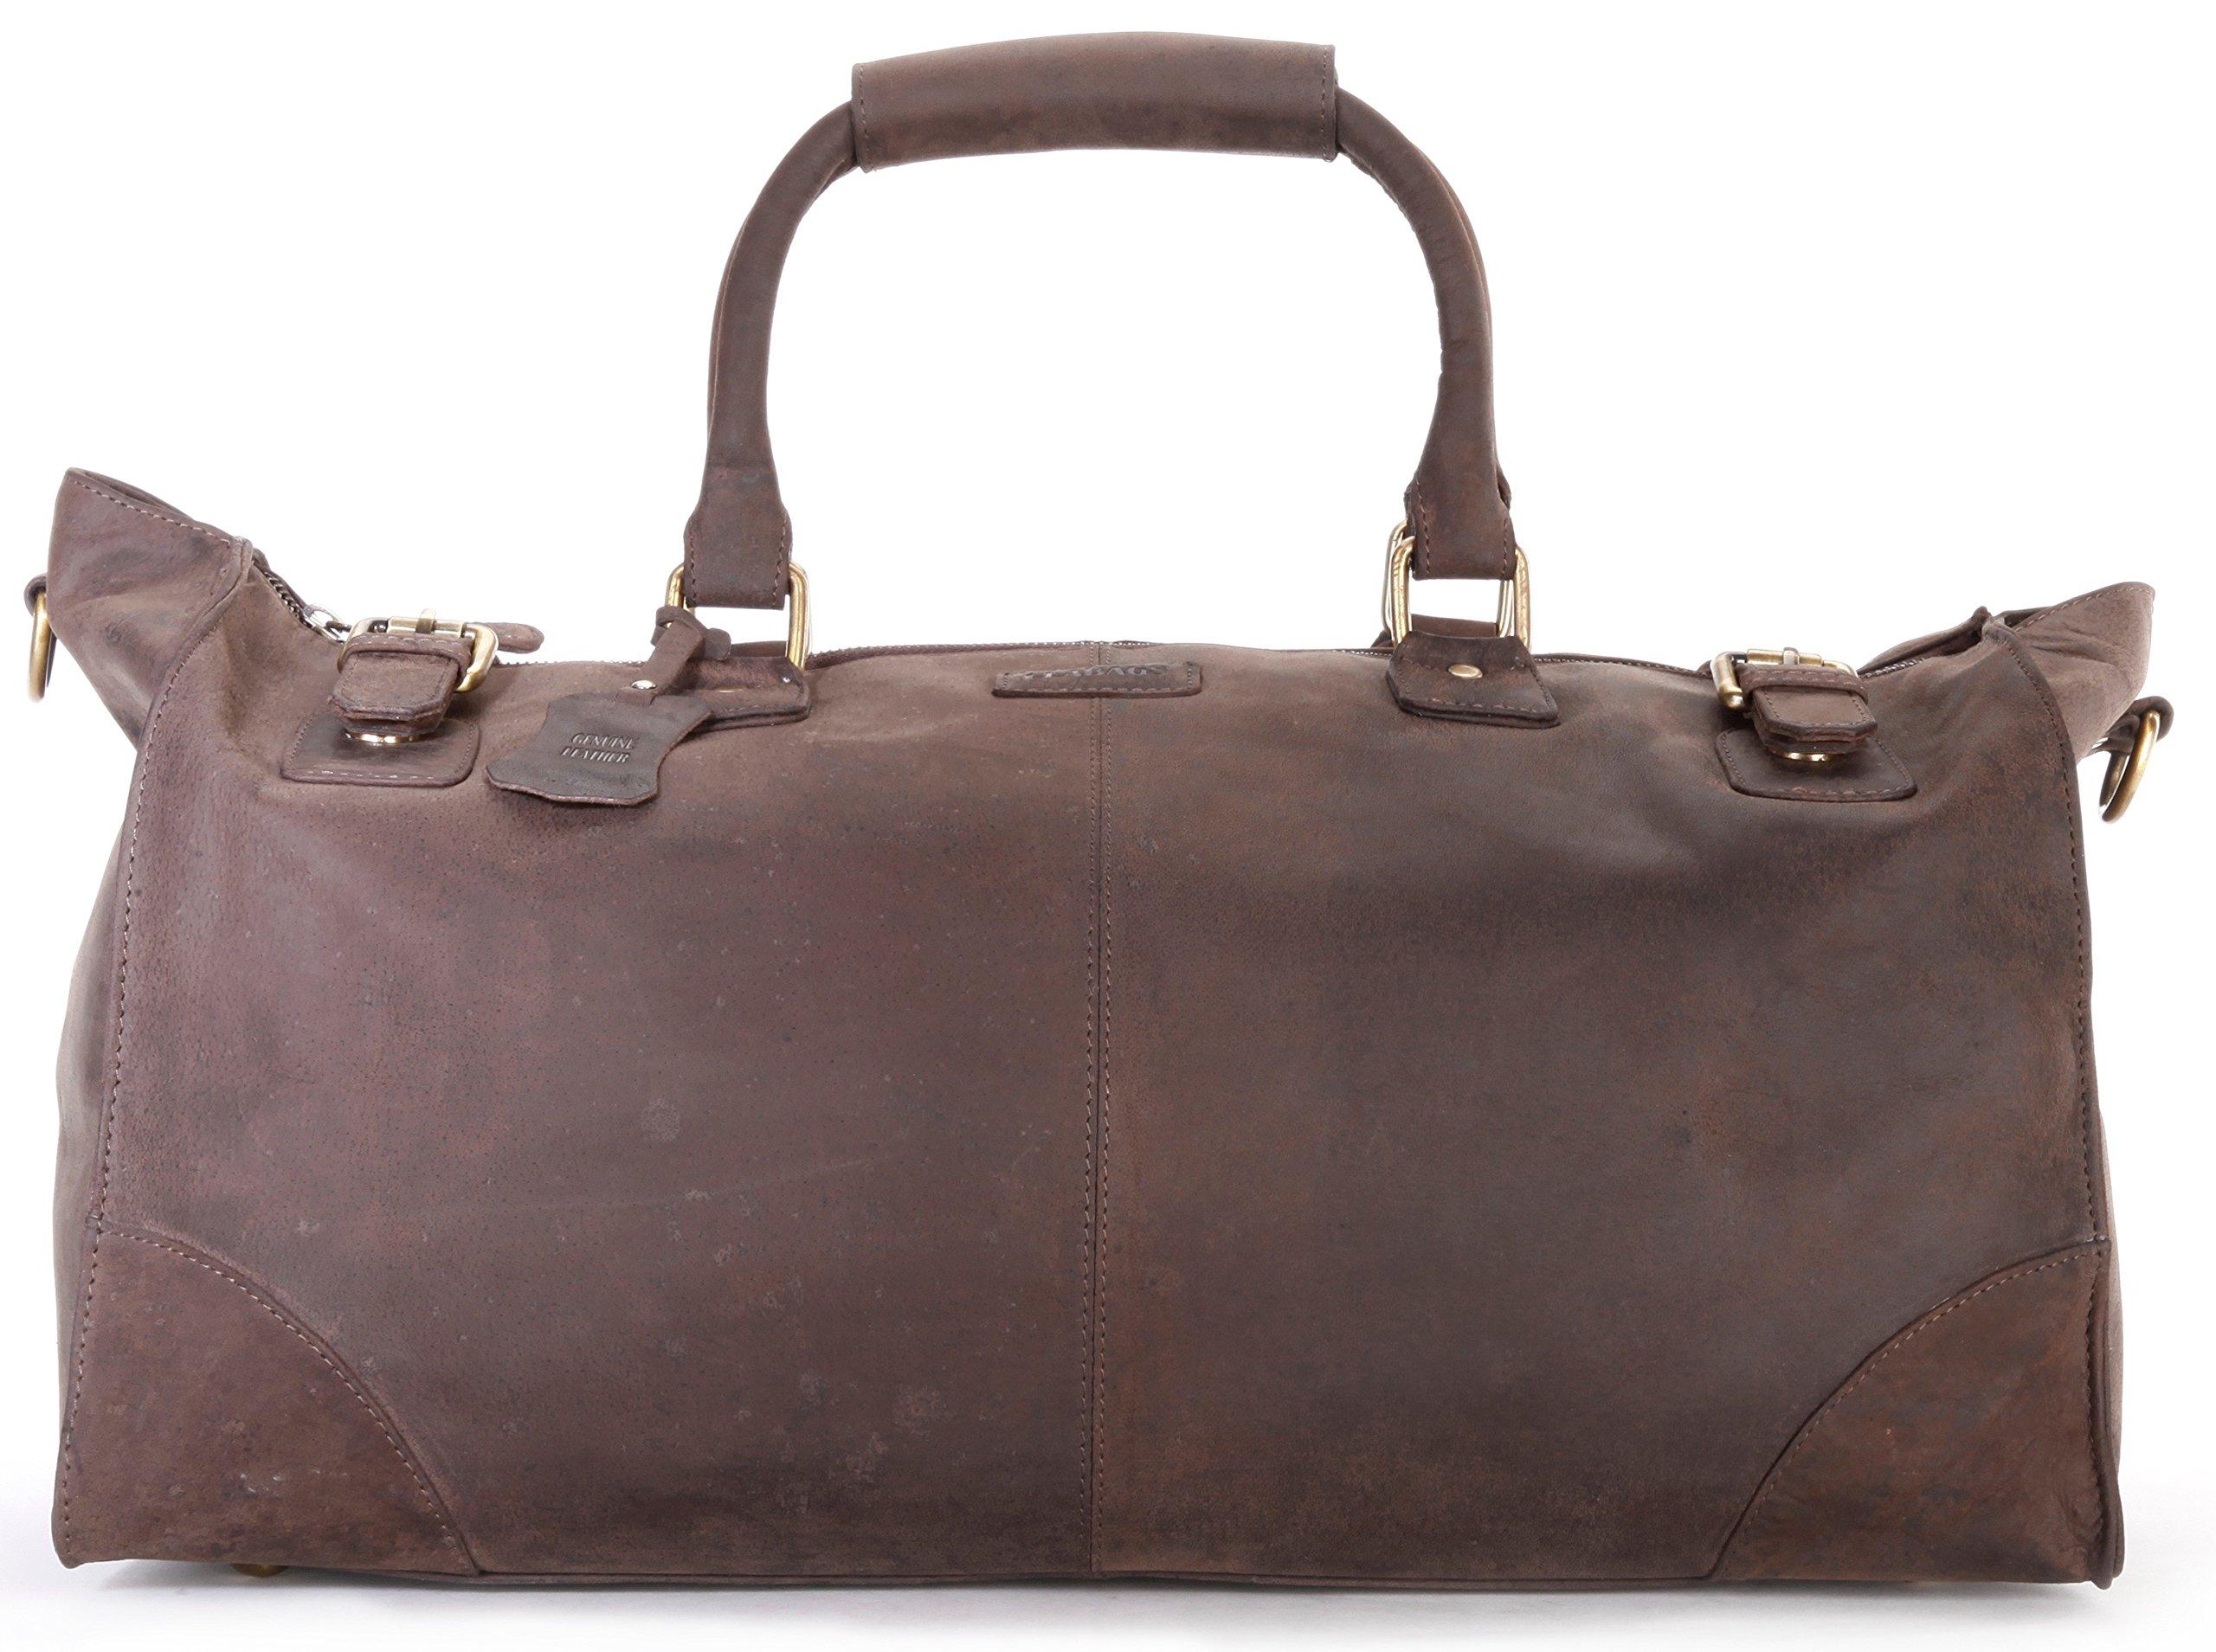 LEABAGS Durham genuine buffalo leather duffle bag in vintage style - Nutmeg